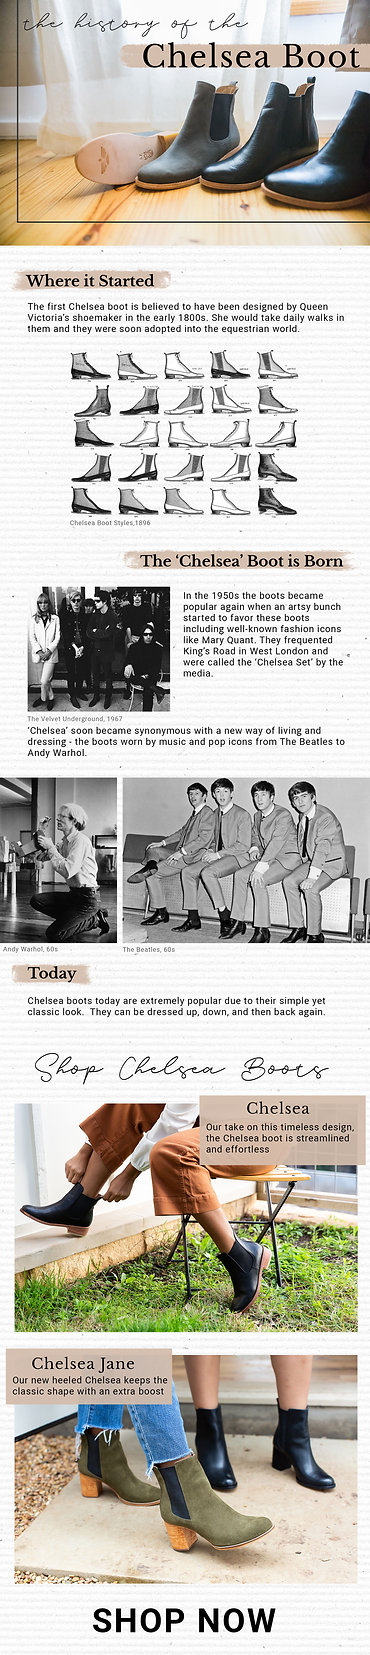 Chelsea history copy.jpg